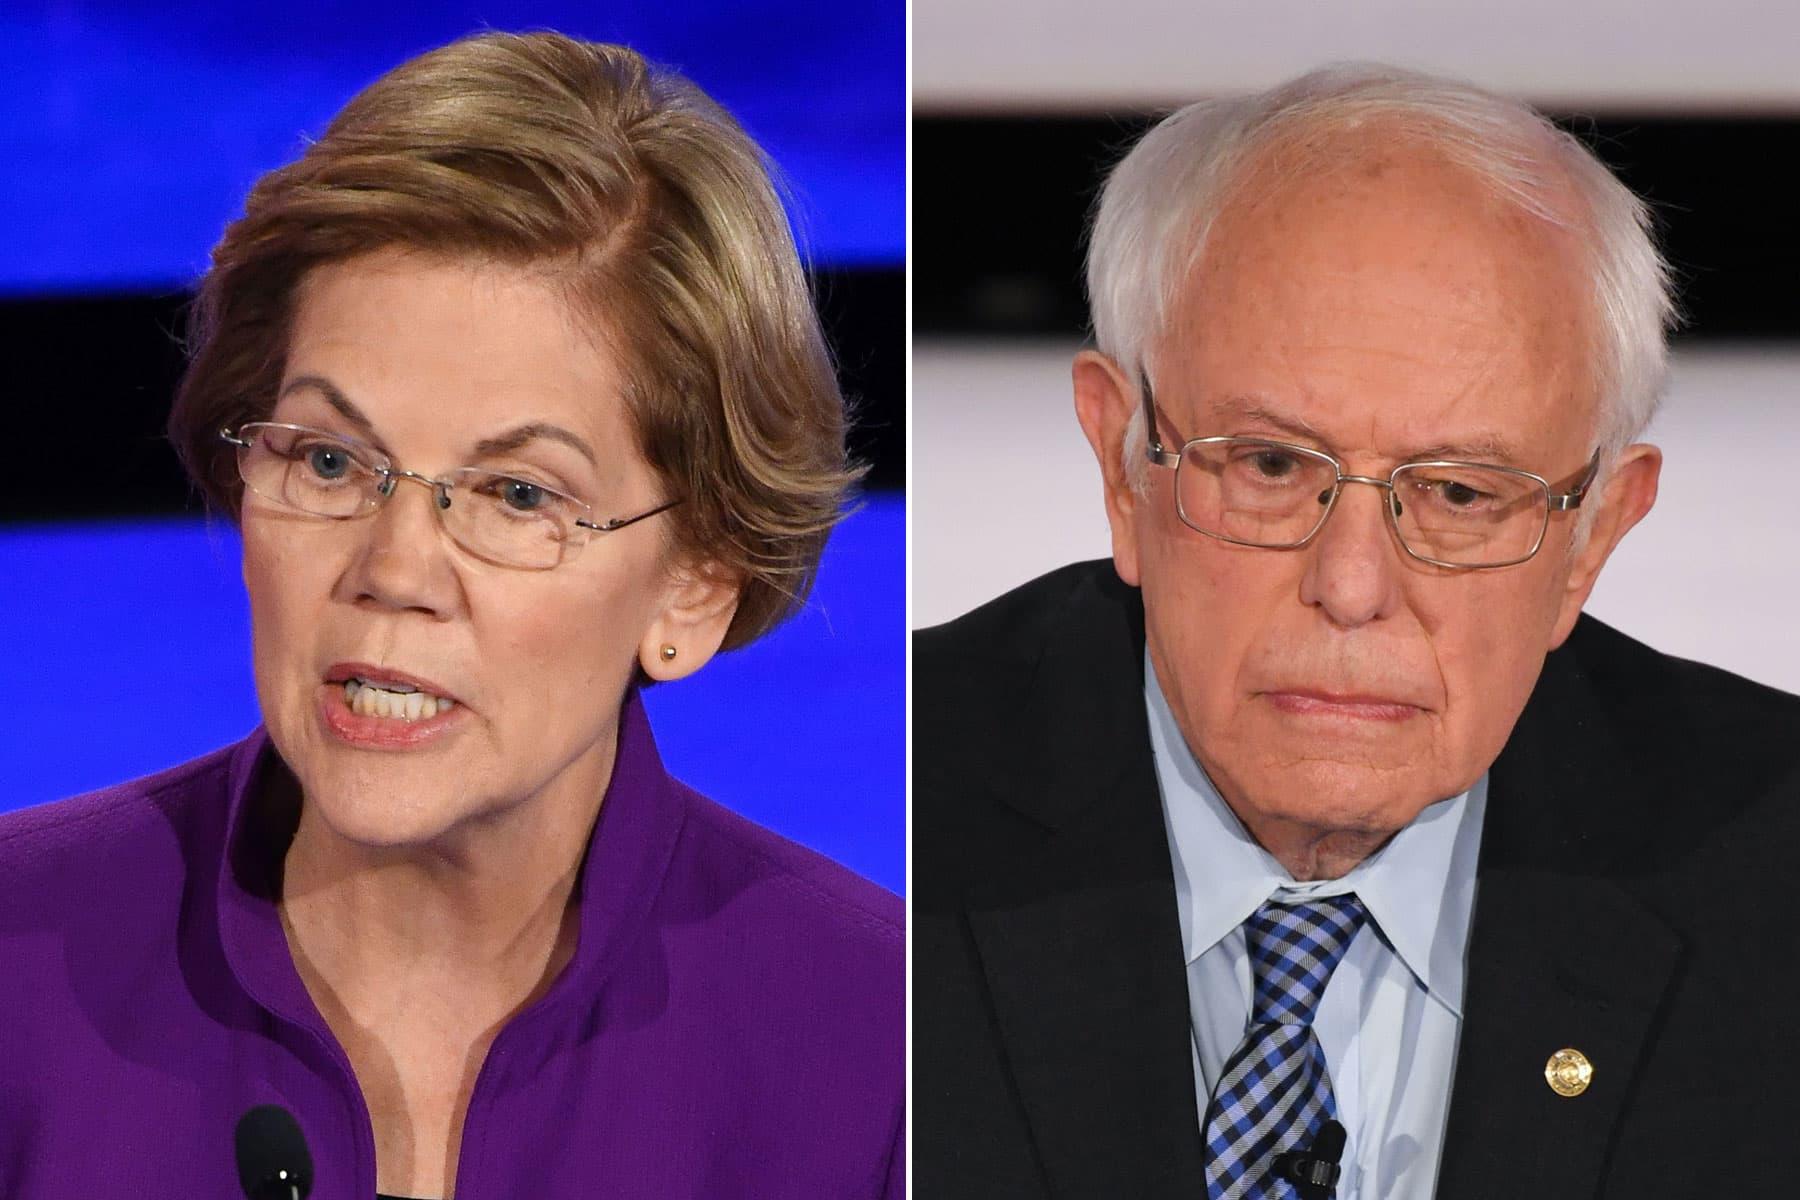 Bernie Sanders and Elizabeth Warren square off over Trump's USMCA trade deal